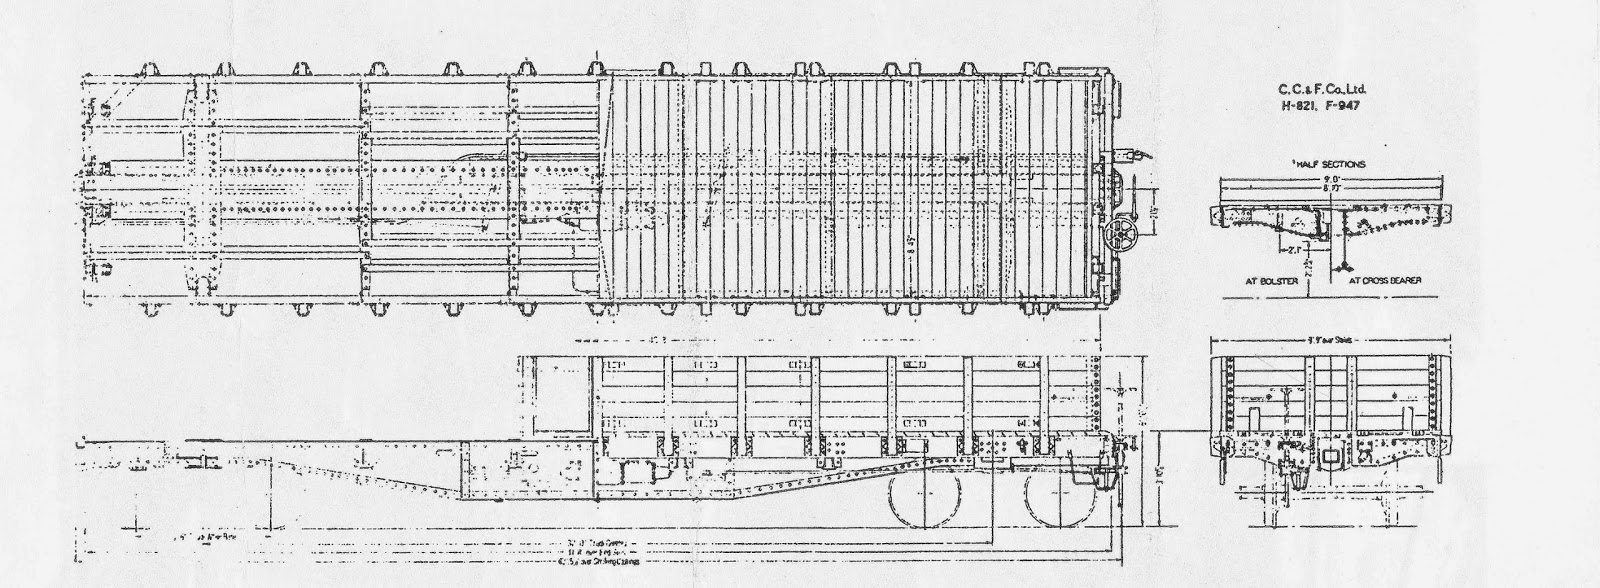 medium resolution of 1950 western car lift schematic custom wiring diagram u2022 chamberlain garage door sensor wiring residential garage electrical wiring diagrams